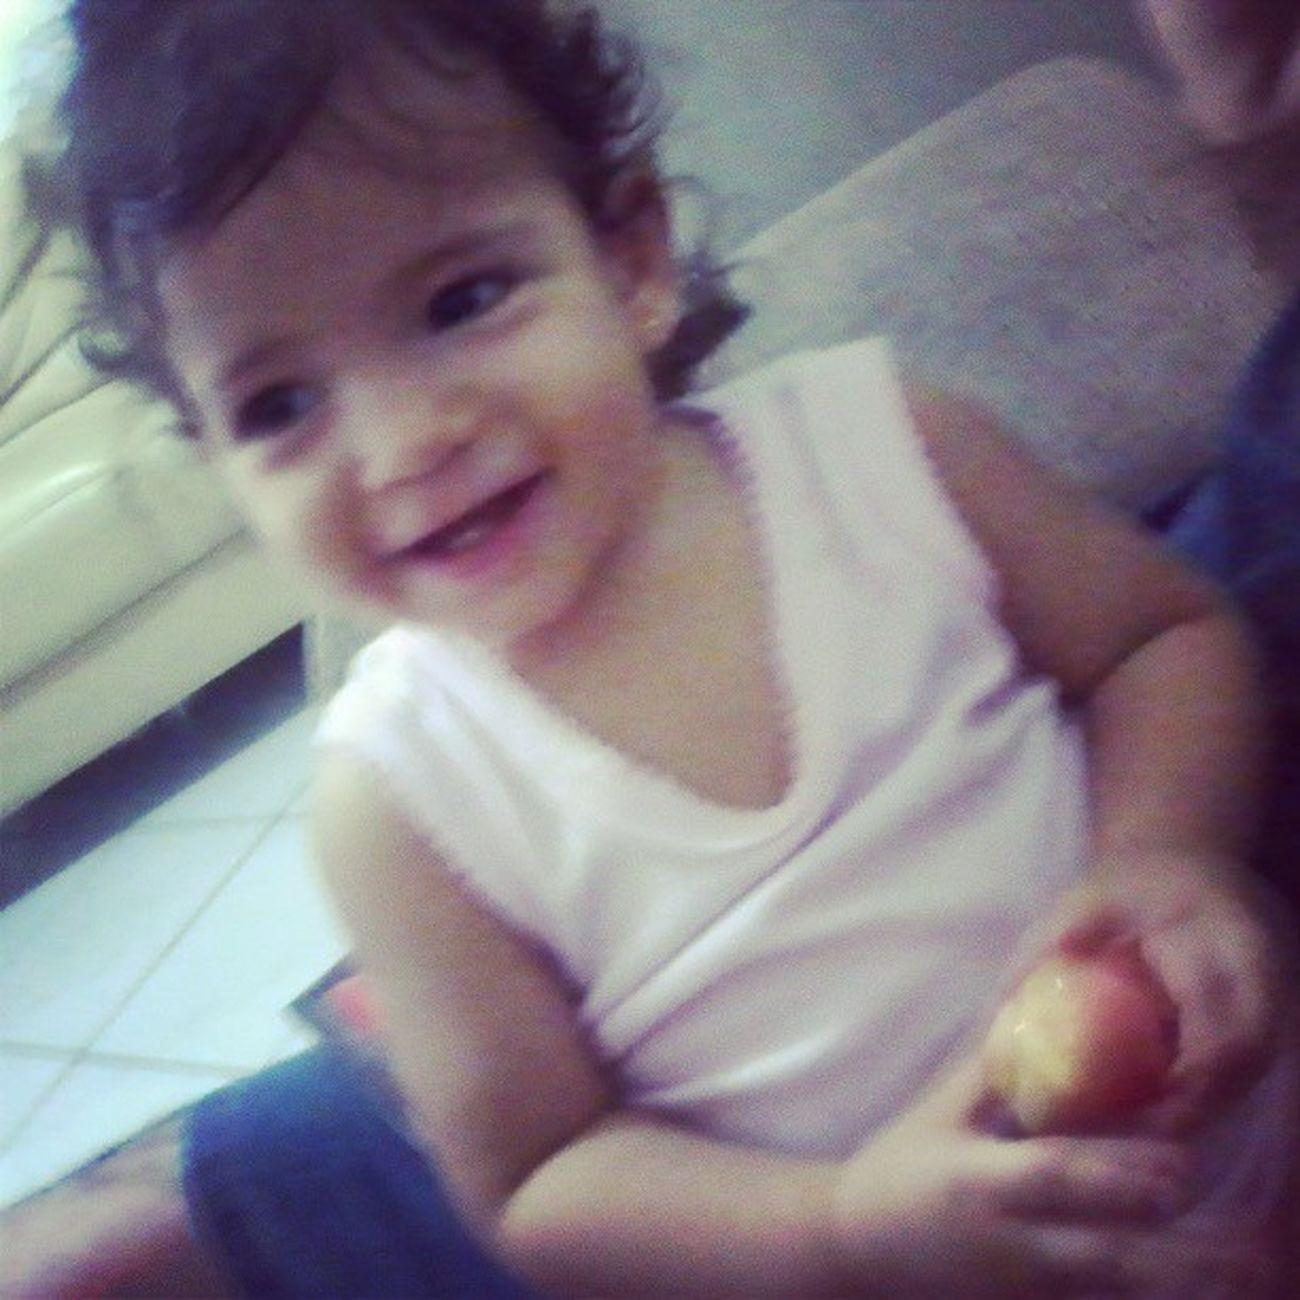 Emi Crizogno *-* Baby Love Cute Photo photooftheday picoftheday instaphoto instagood instapic istamood